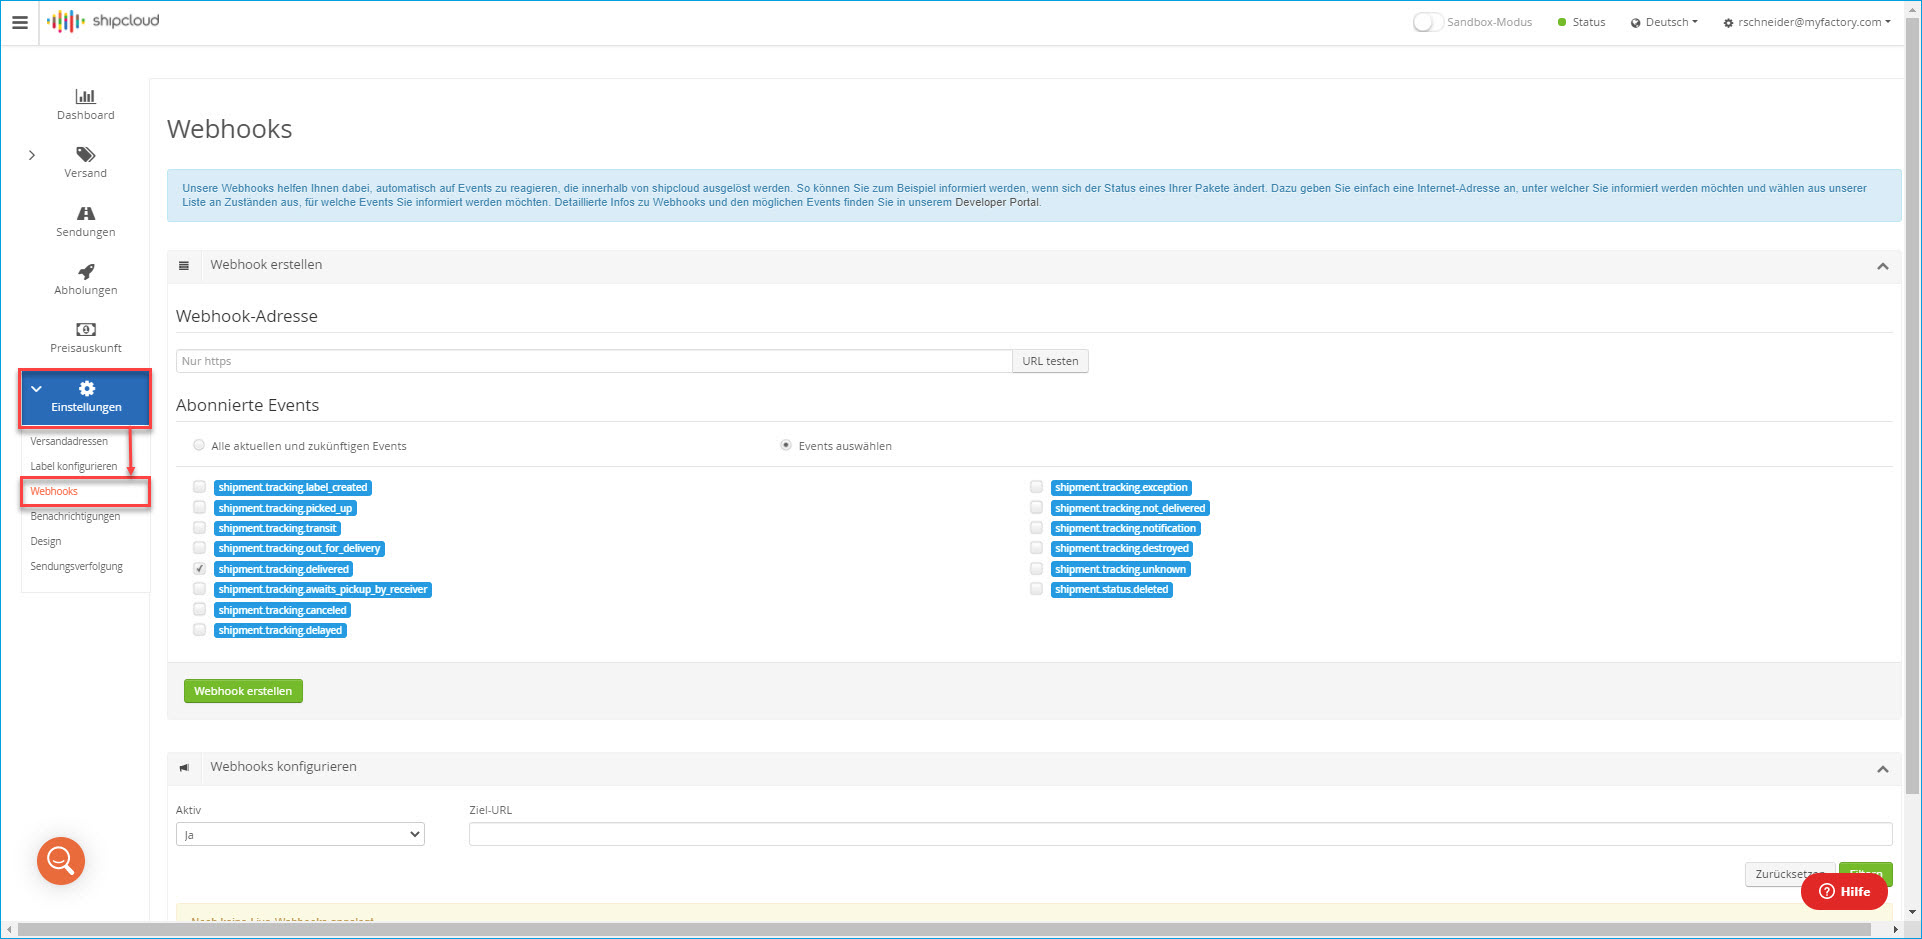 Shipcloud-API 4